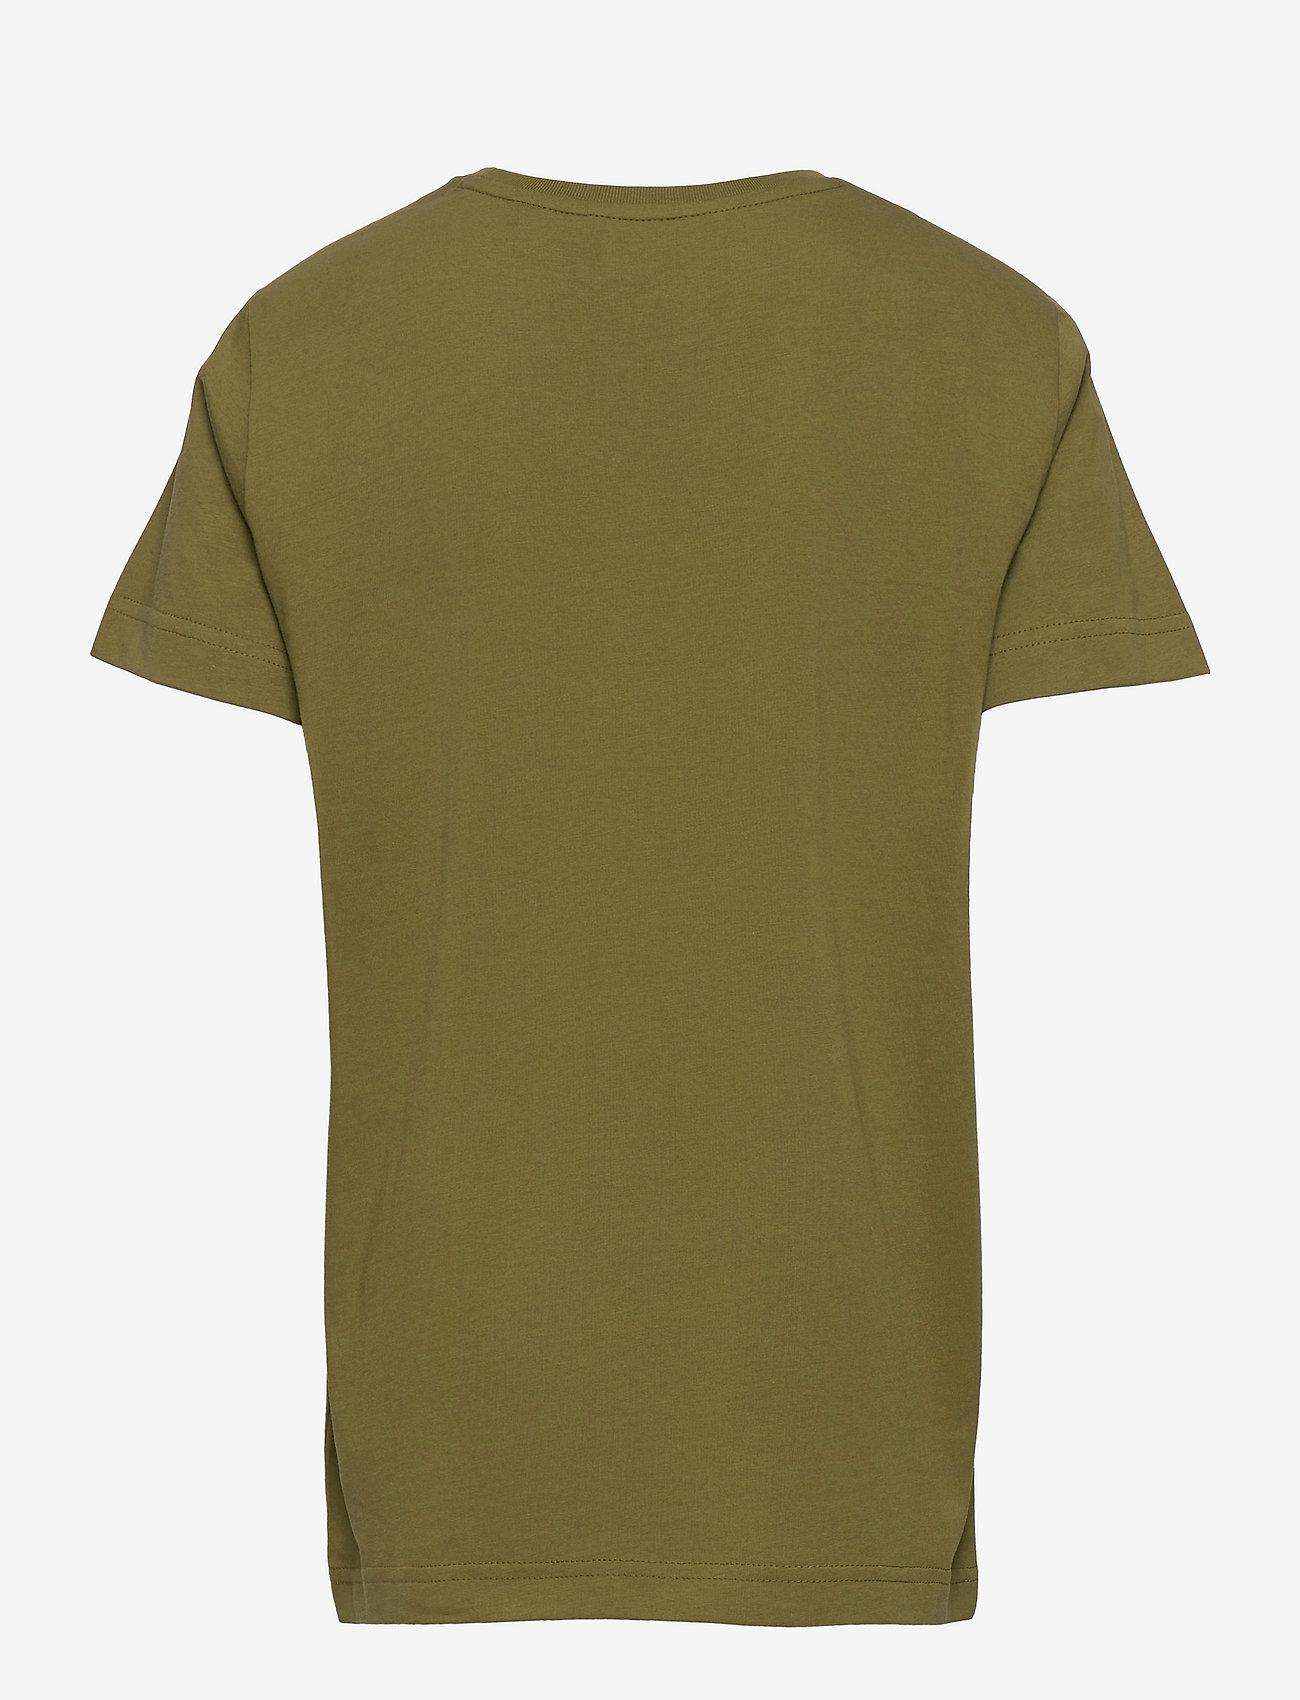 GANT - ARCHIVE SHIELD EMB SS T-SHIRT - short-sleeved - olive branch green - 1